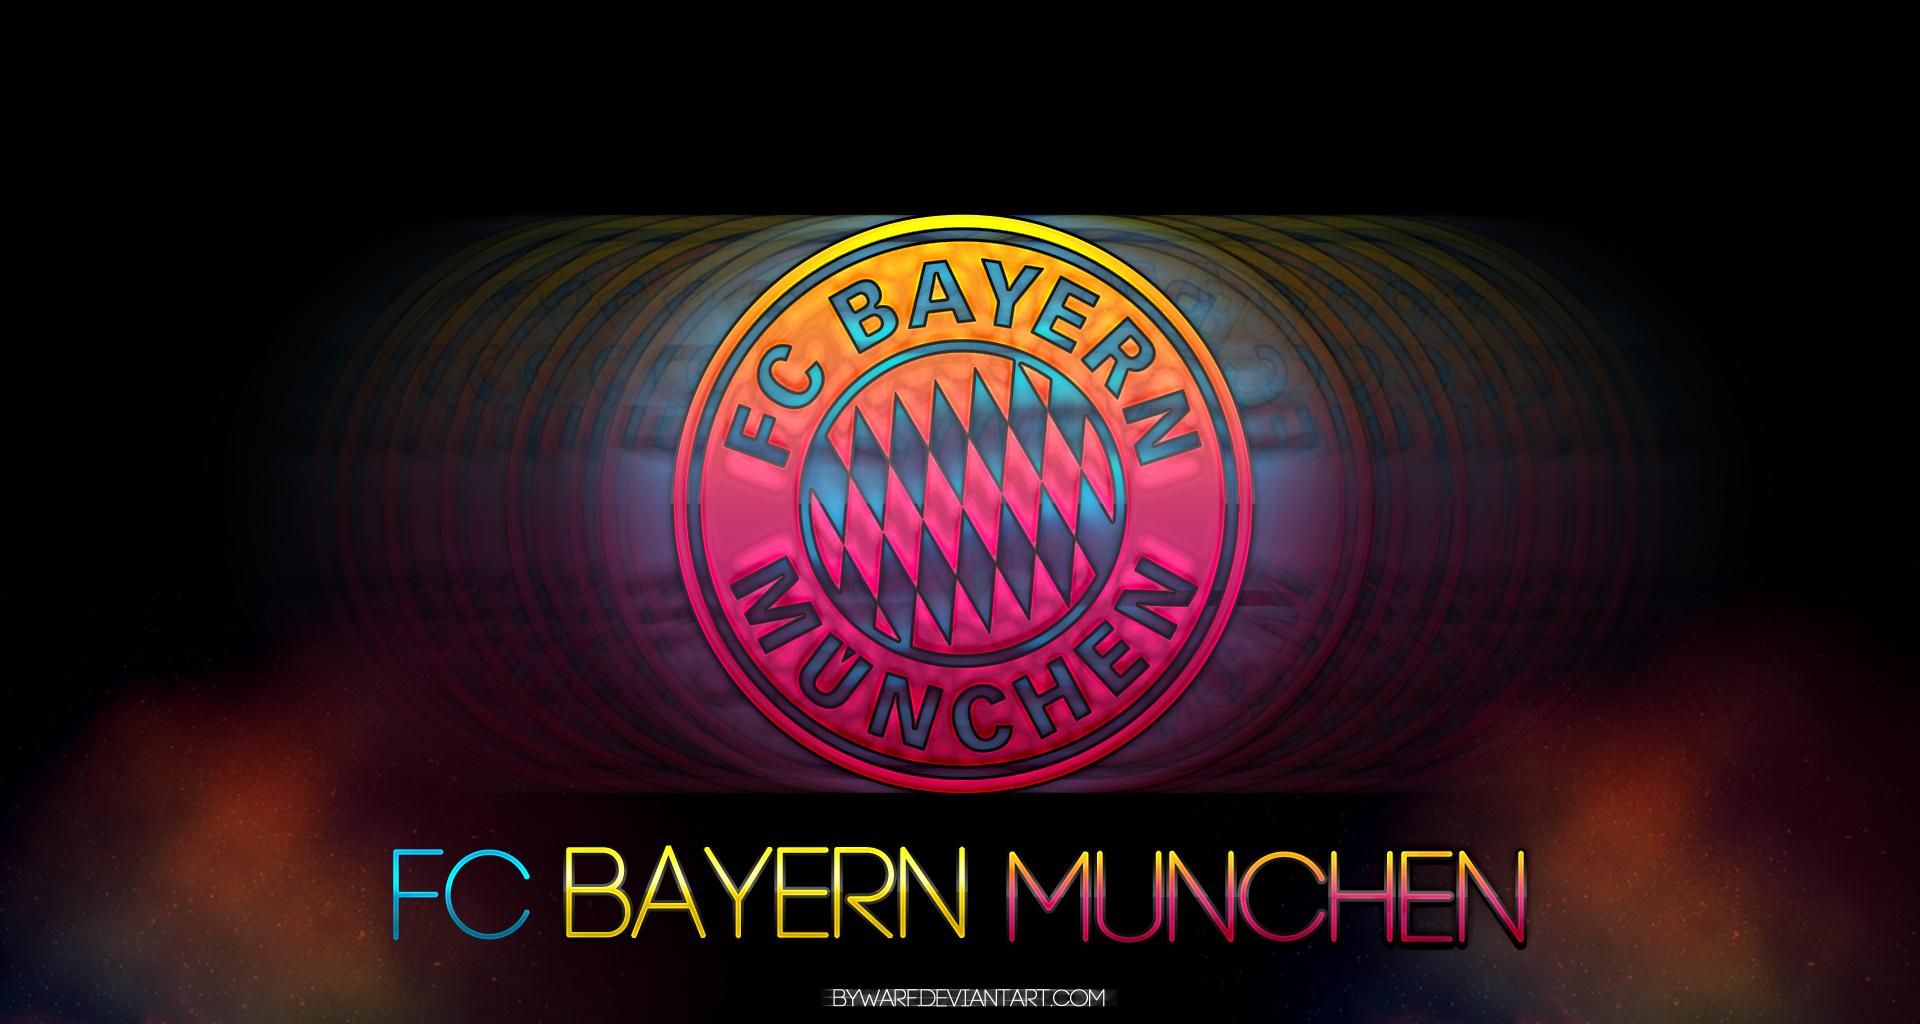 Iphone wallpaper bayern munchen - Bayern Munchen Wallpaper For Android Wallpapersafari